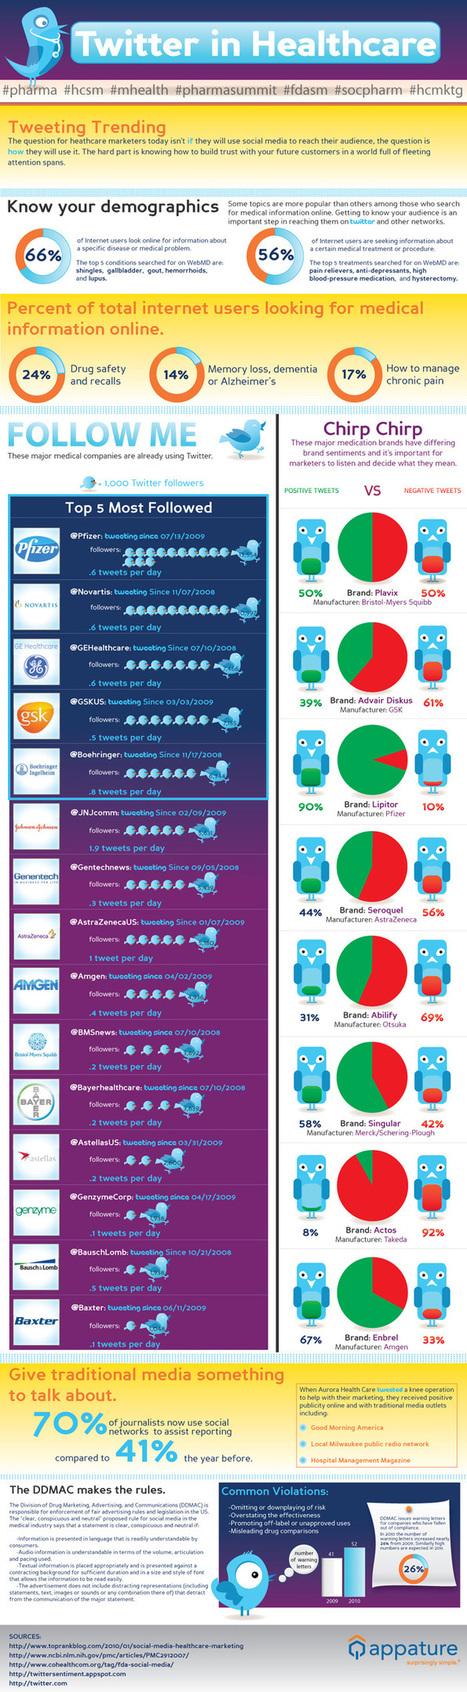 Twitter in healthcare - Statistics | eSalud Social Media | Scoop.it